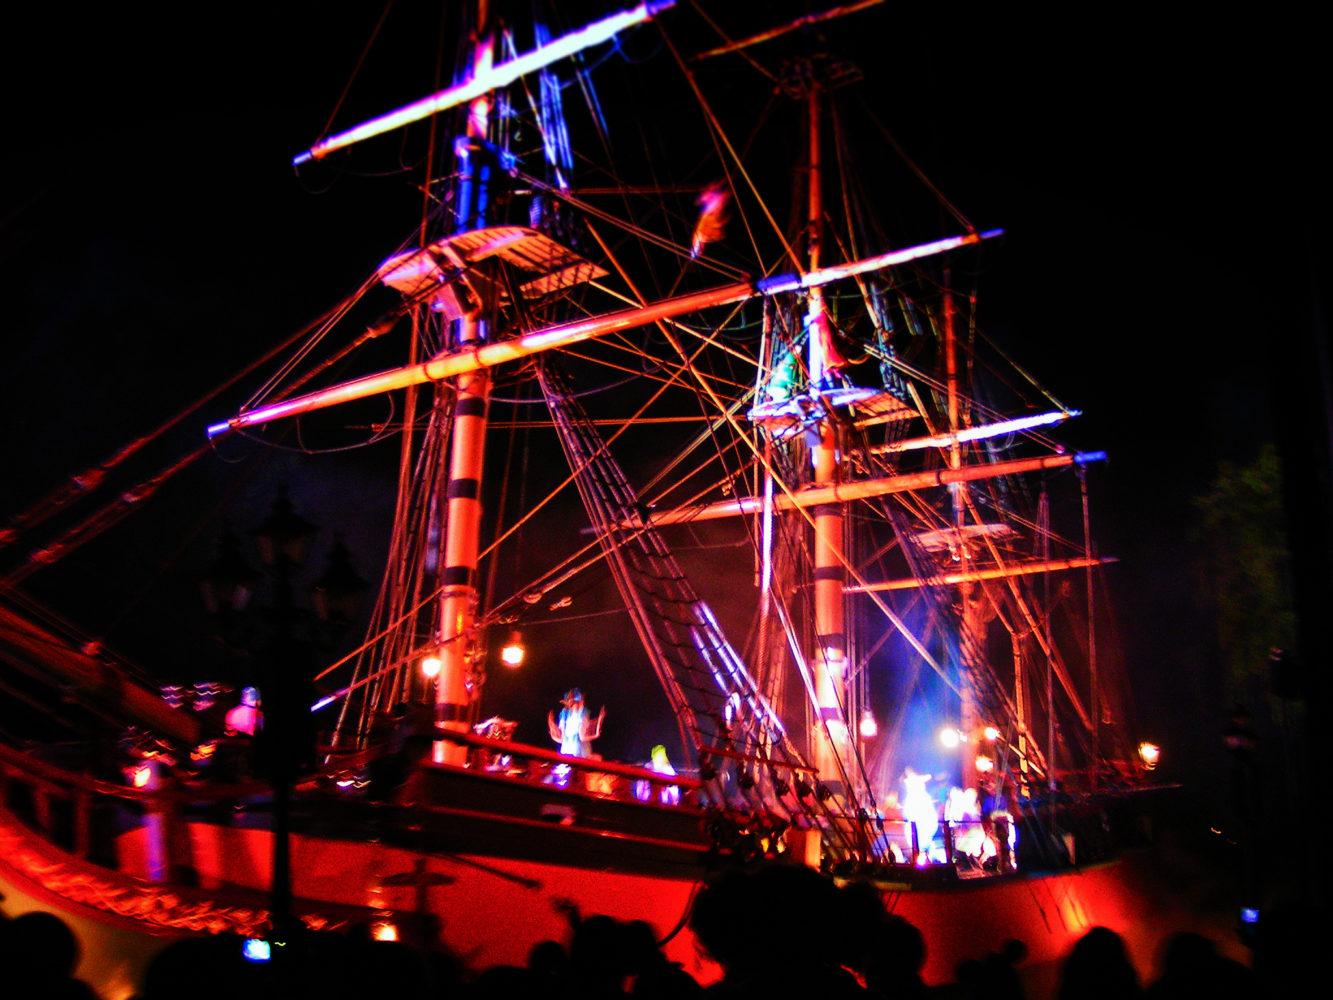 PIrate Ship in Fantasmic Disneyland 1